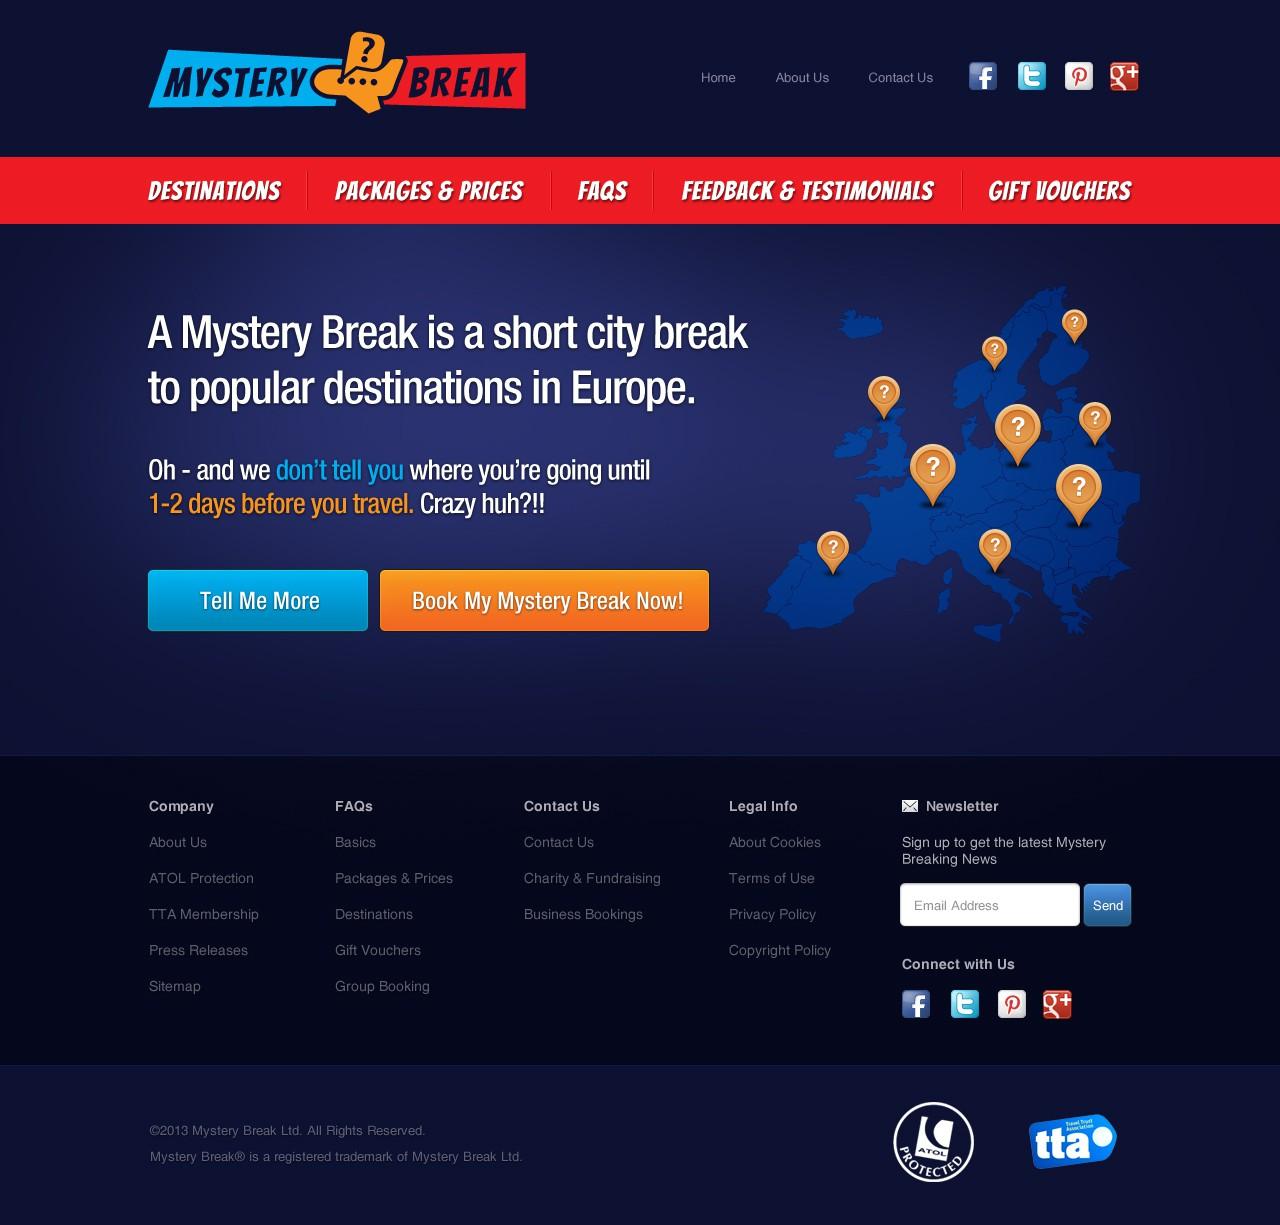 New website design wanted for Mystery Break